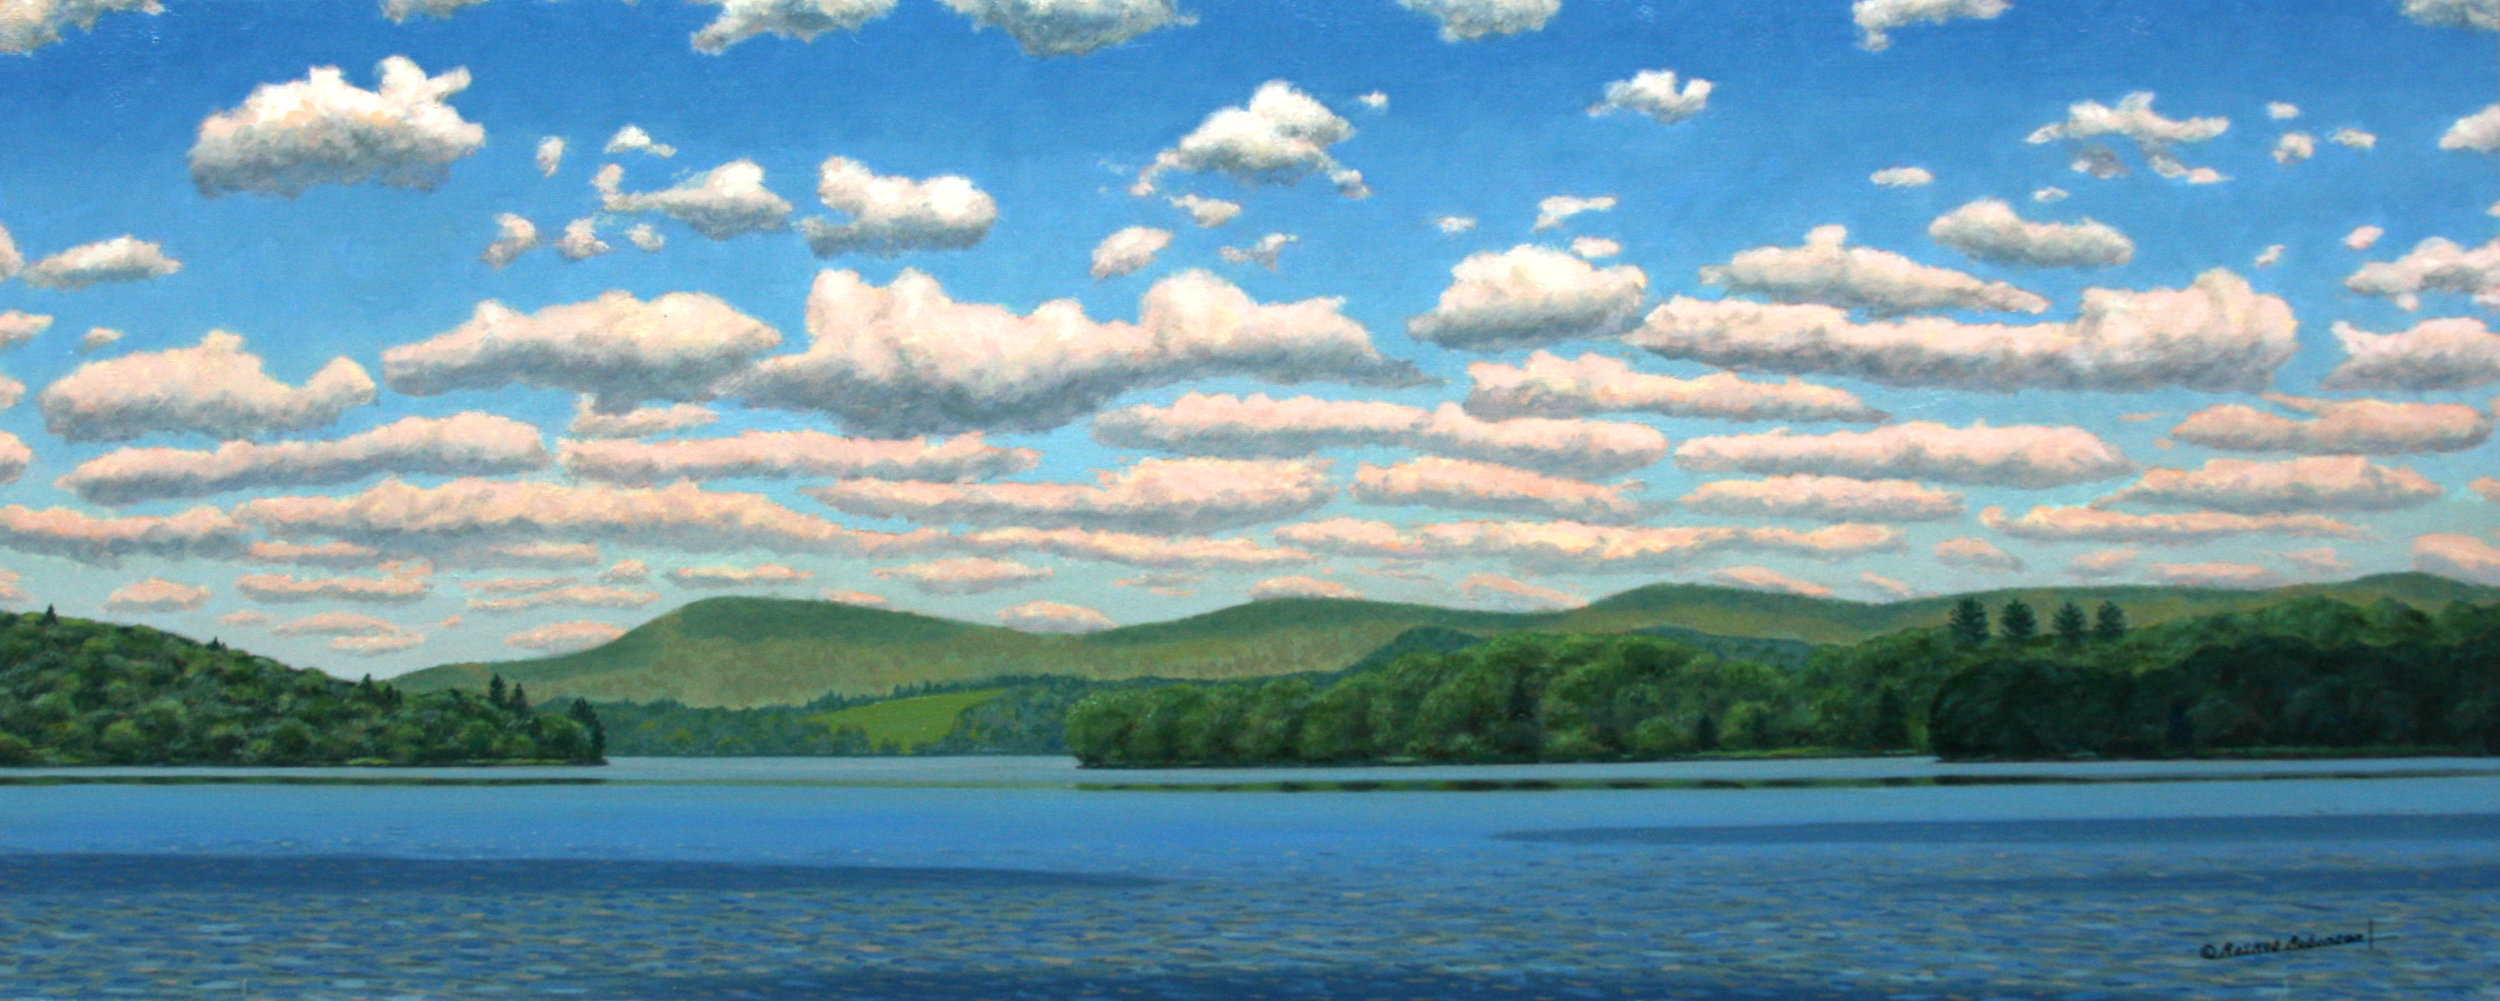 Painting of Lake Waramaug by Charles Raskob Robinson